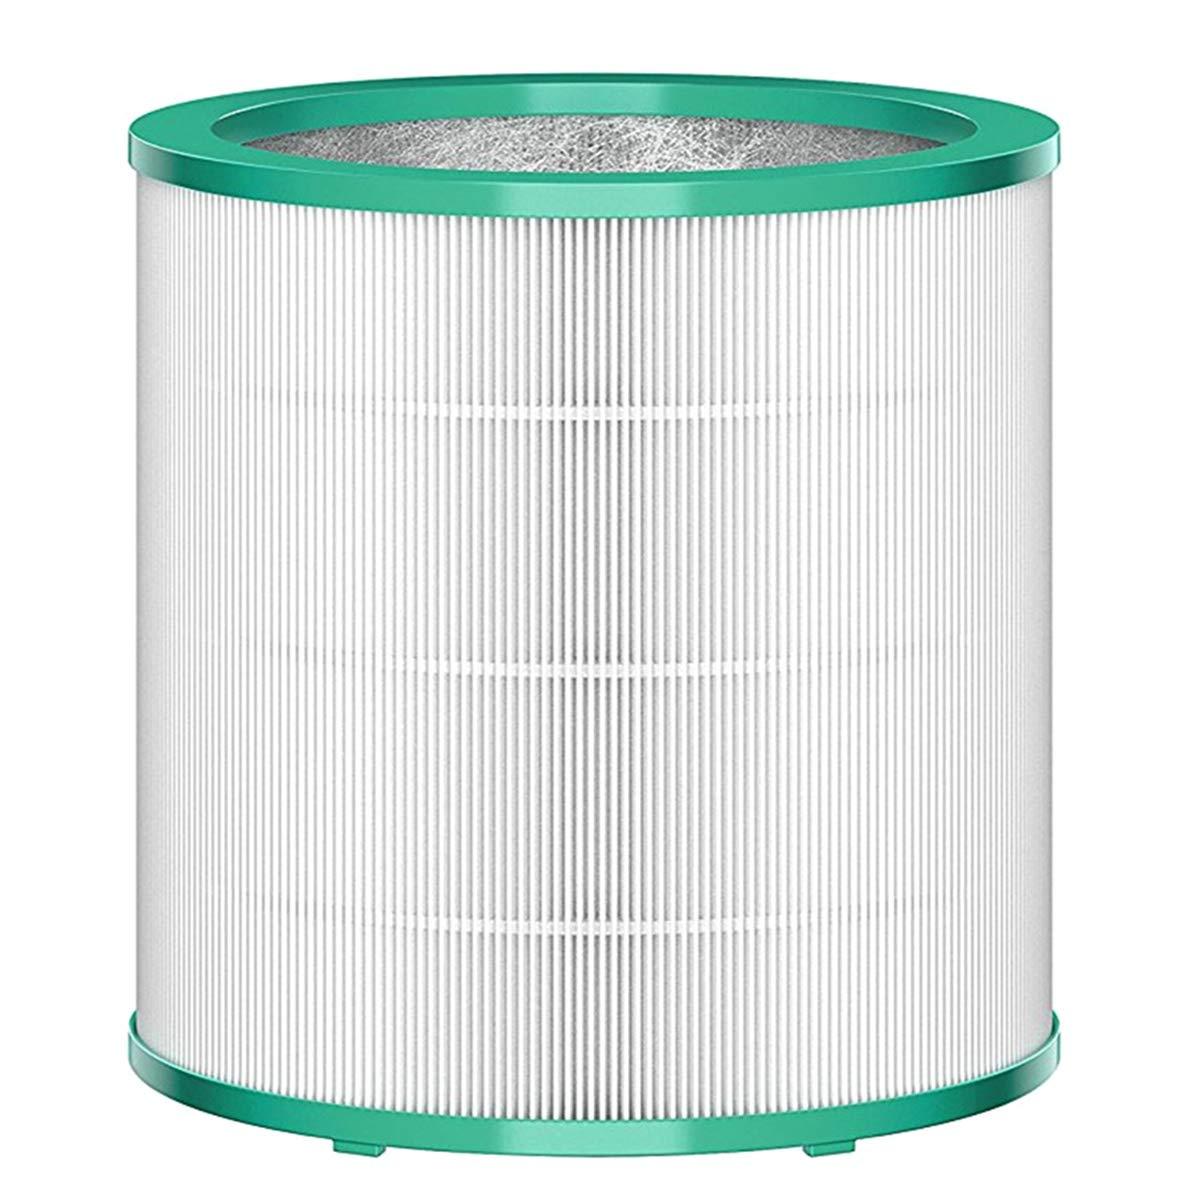 FLN Replacement Filter Compatible Dyson Pure Cool Link TP02 TP03 Dyson Tower Purifier